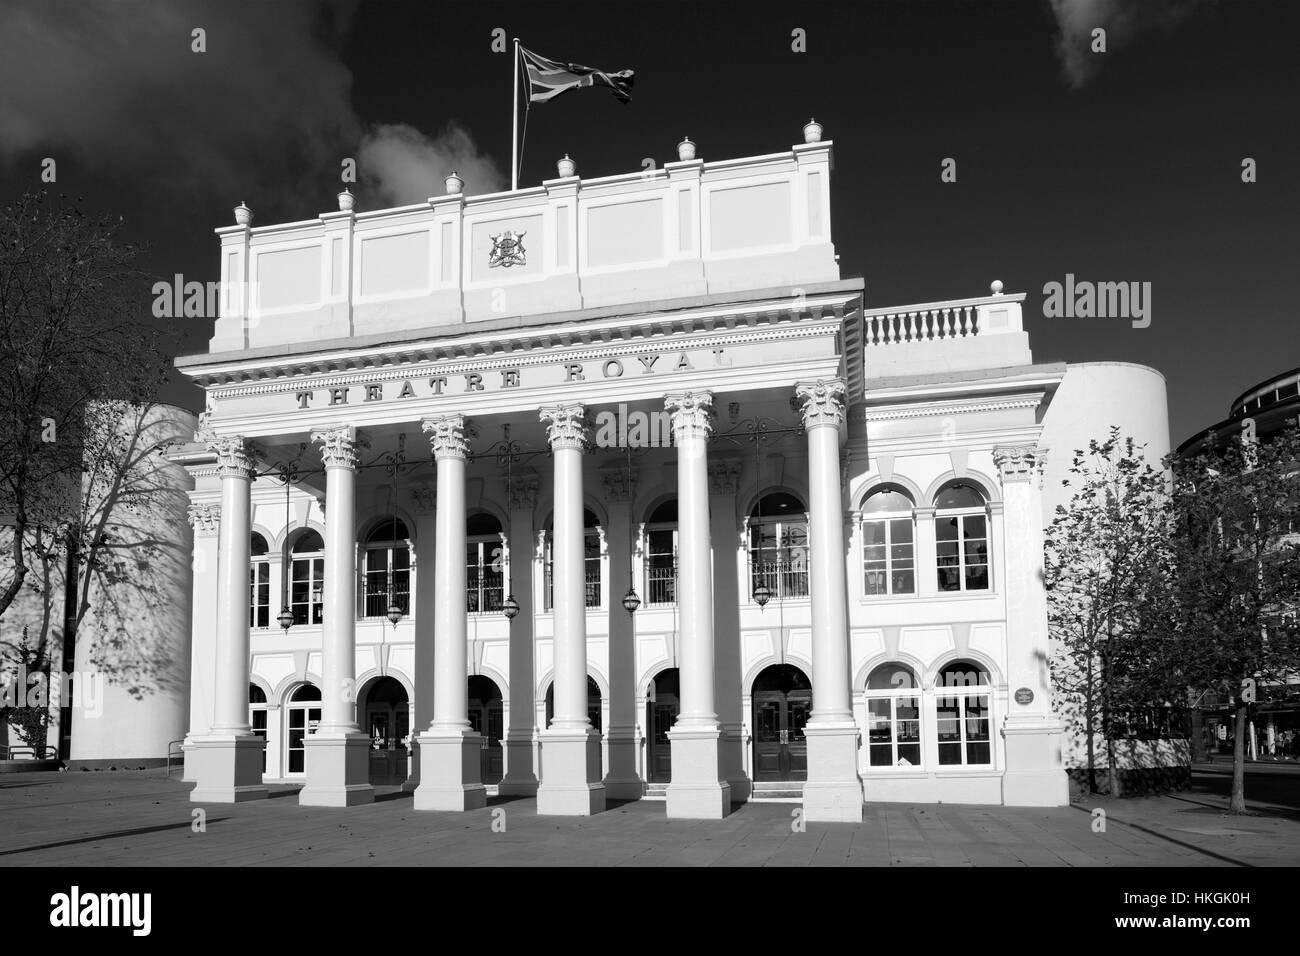 Summer, August, September, The Theatre Royal building, Nottingham city centre, Nottinghamshire, England, UK - Stock Image